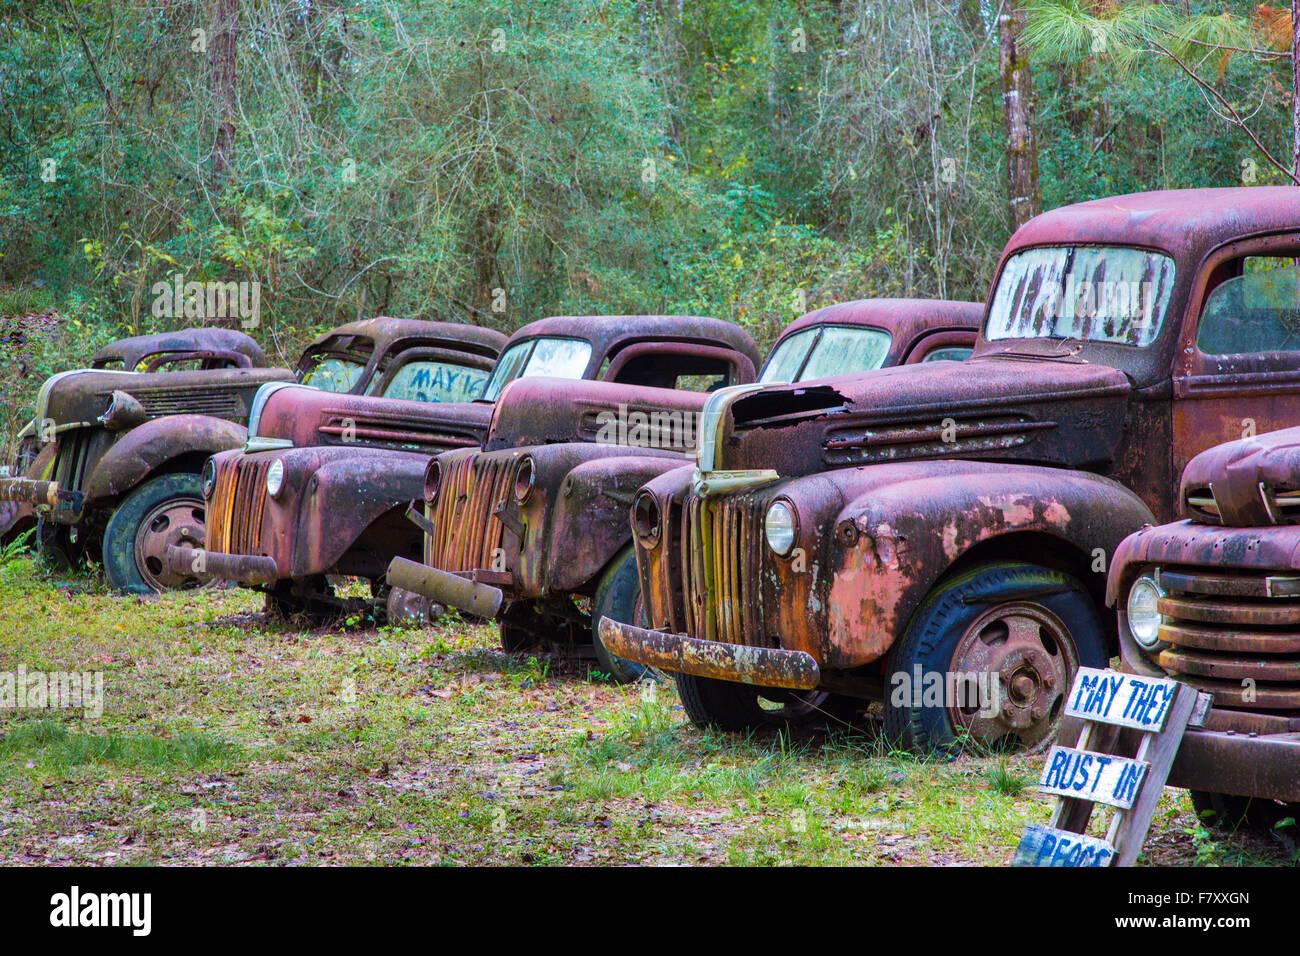 Rusty Old Trucks Stock Photos & Rusty Old Trucks Stock Images - Alamy